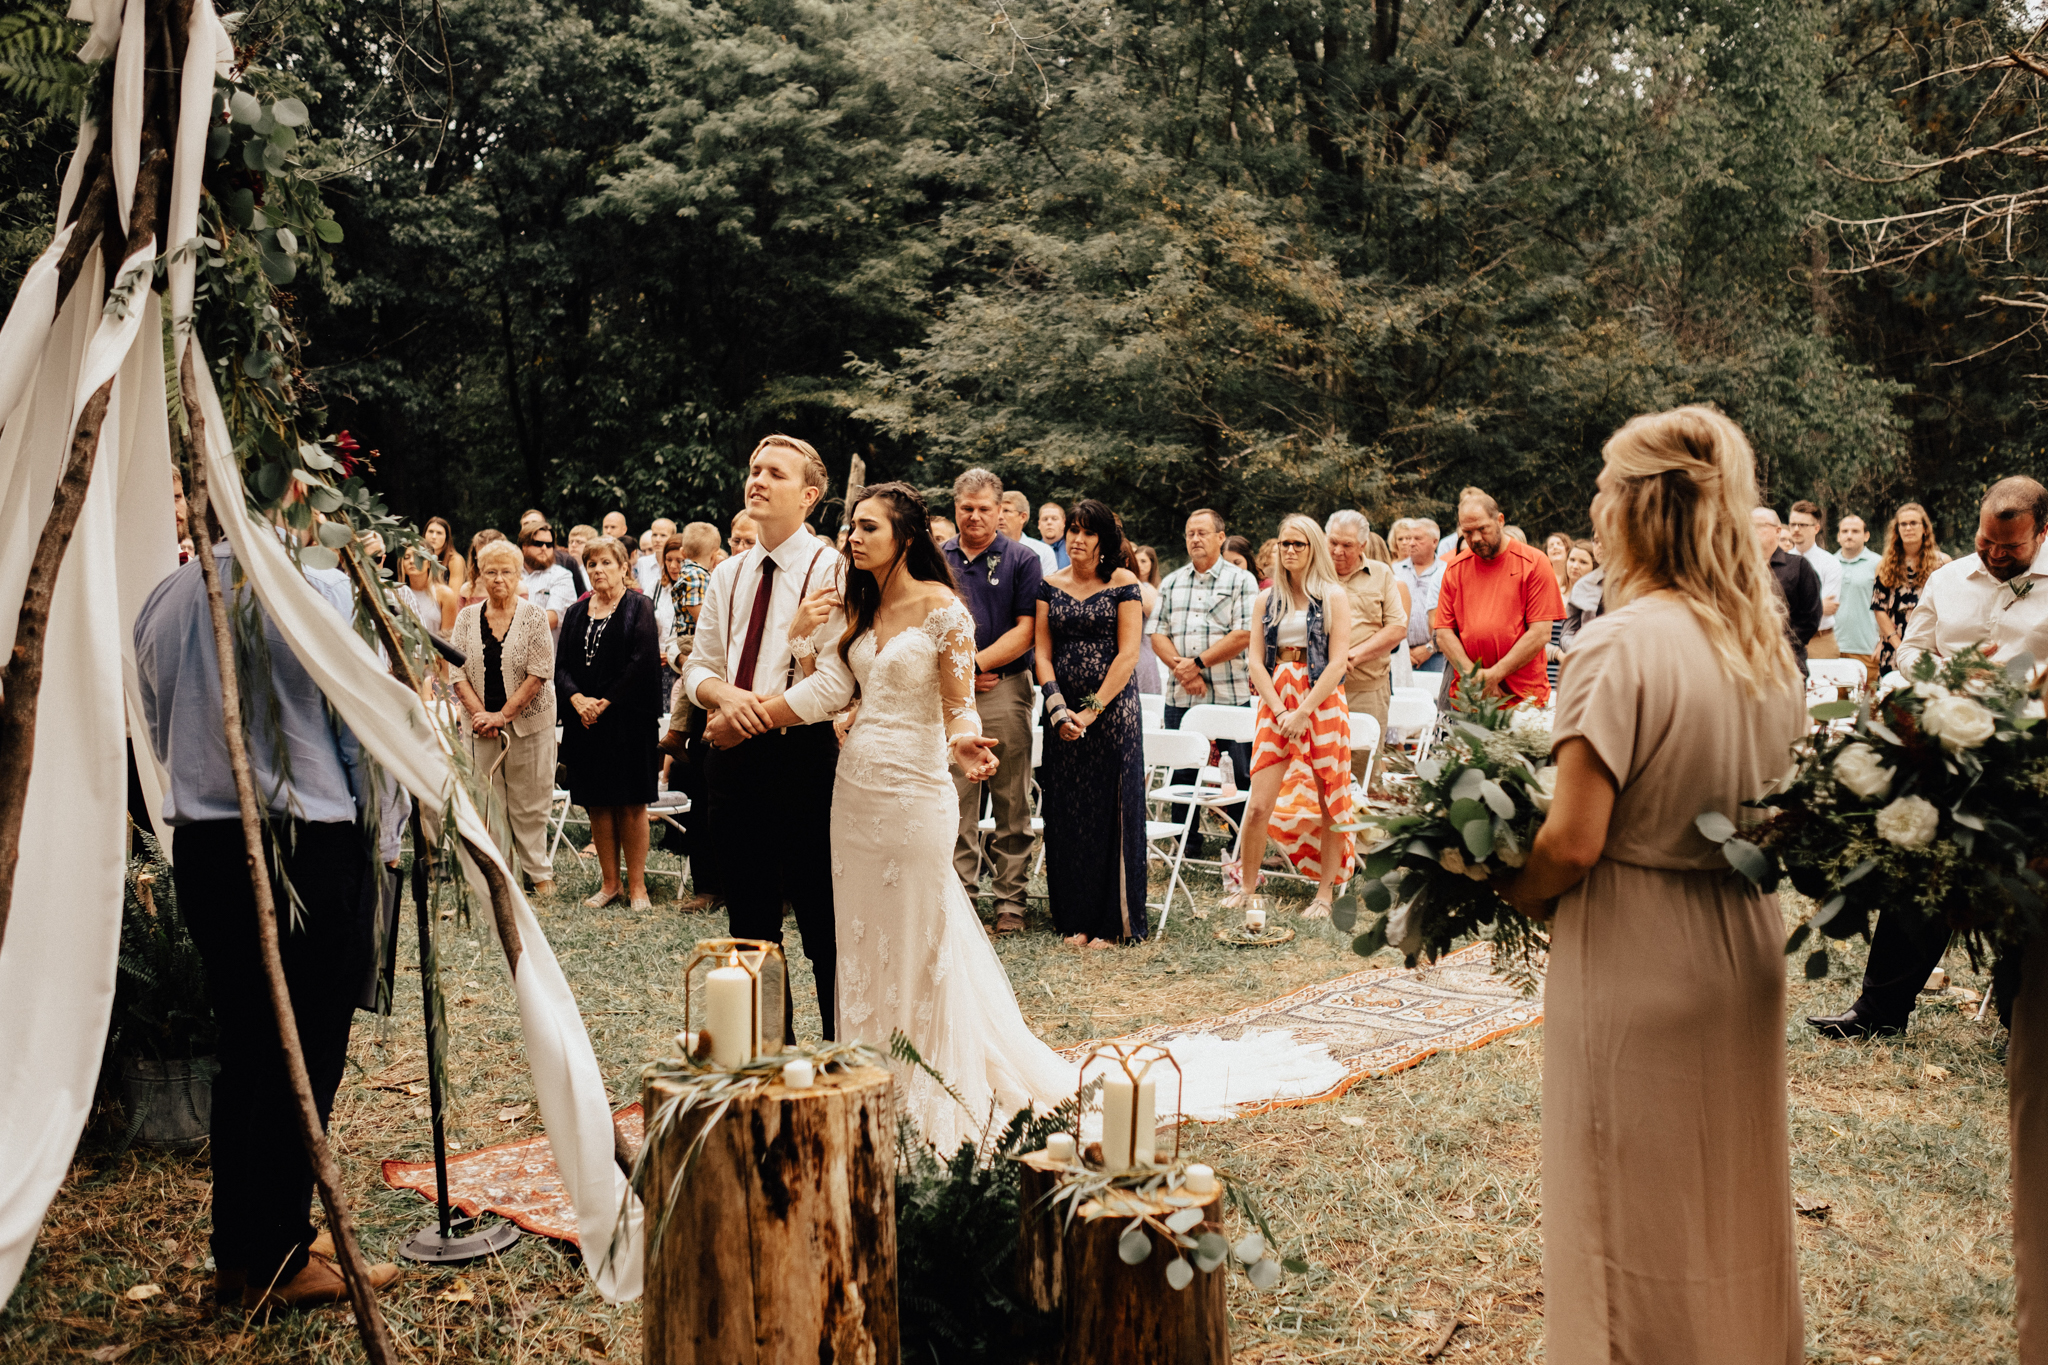 Arizona-Adventure-Elopement-Wedding-Photographer-63.jpg